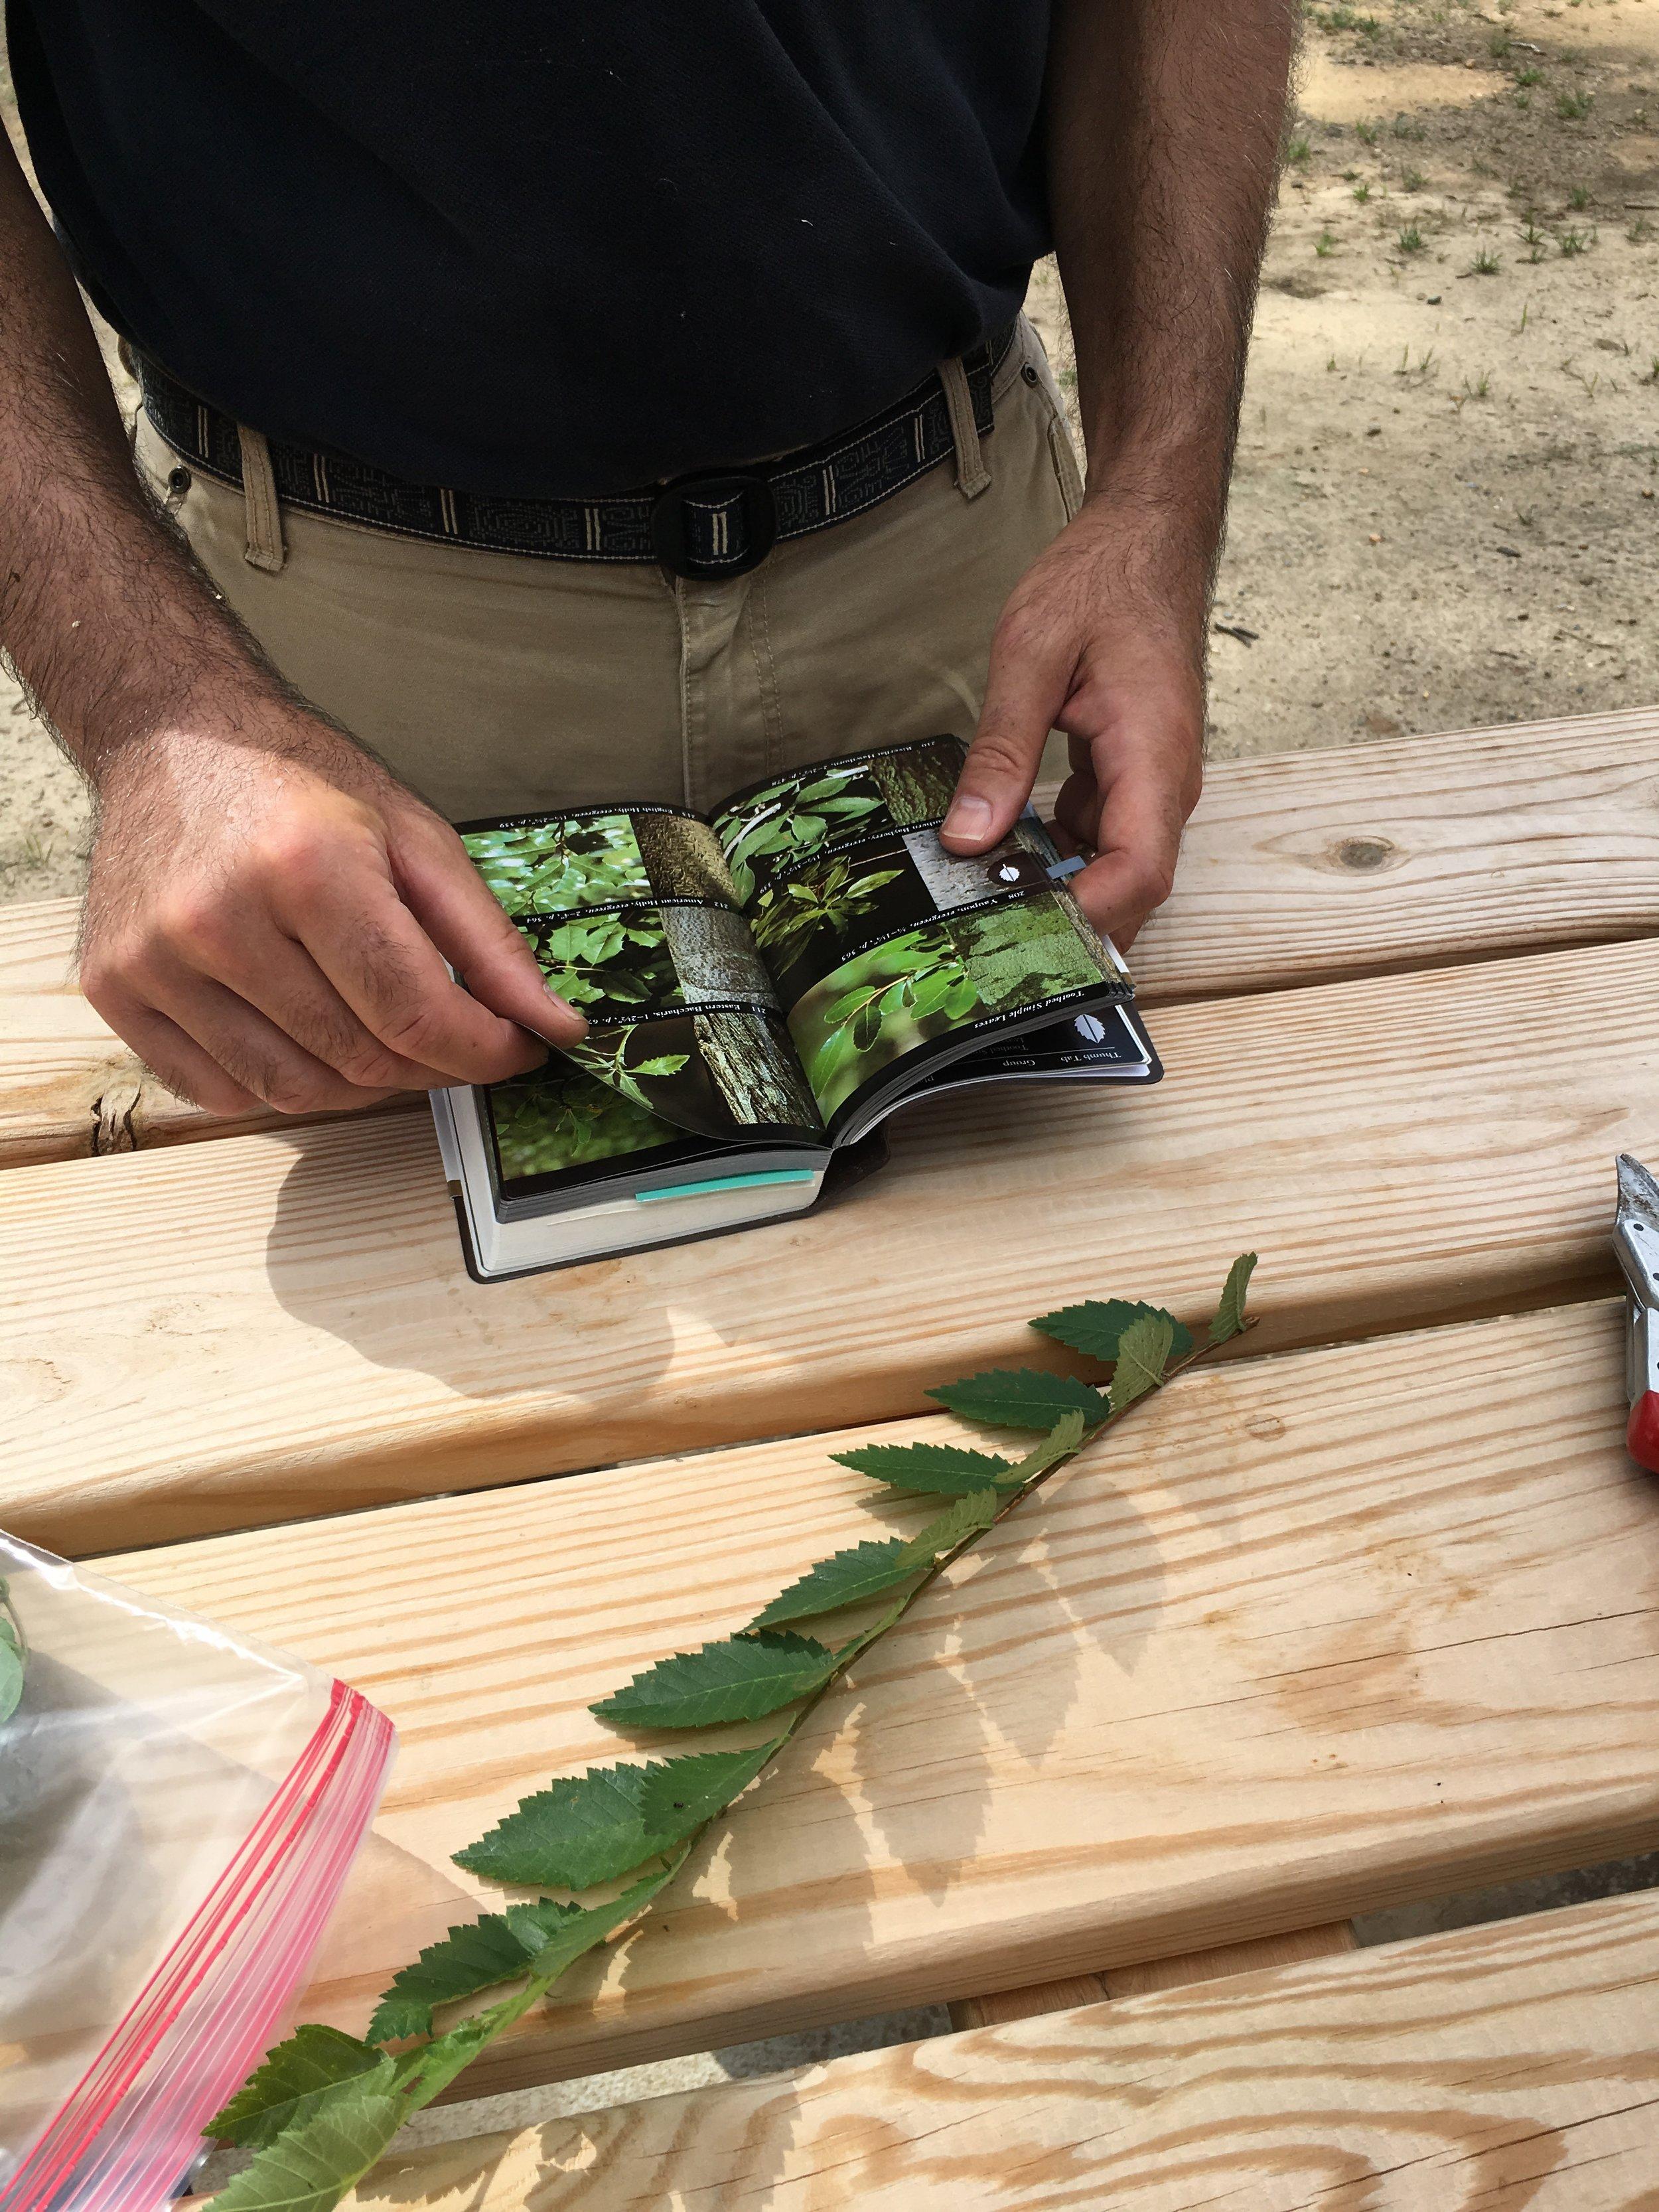 identifying leaves